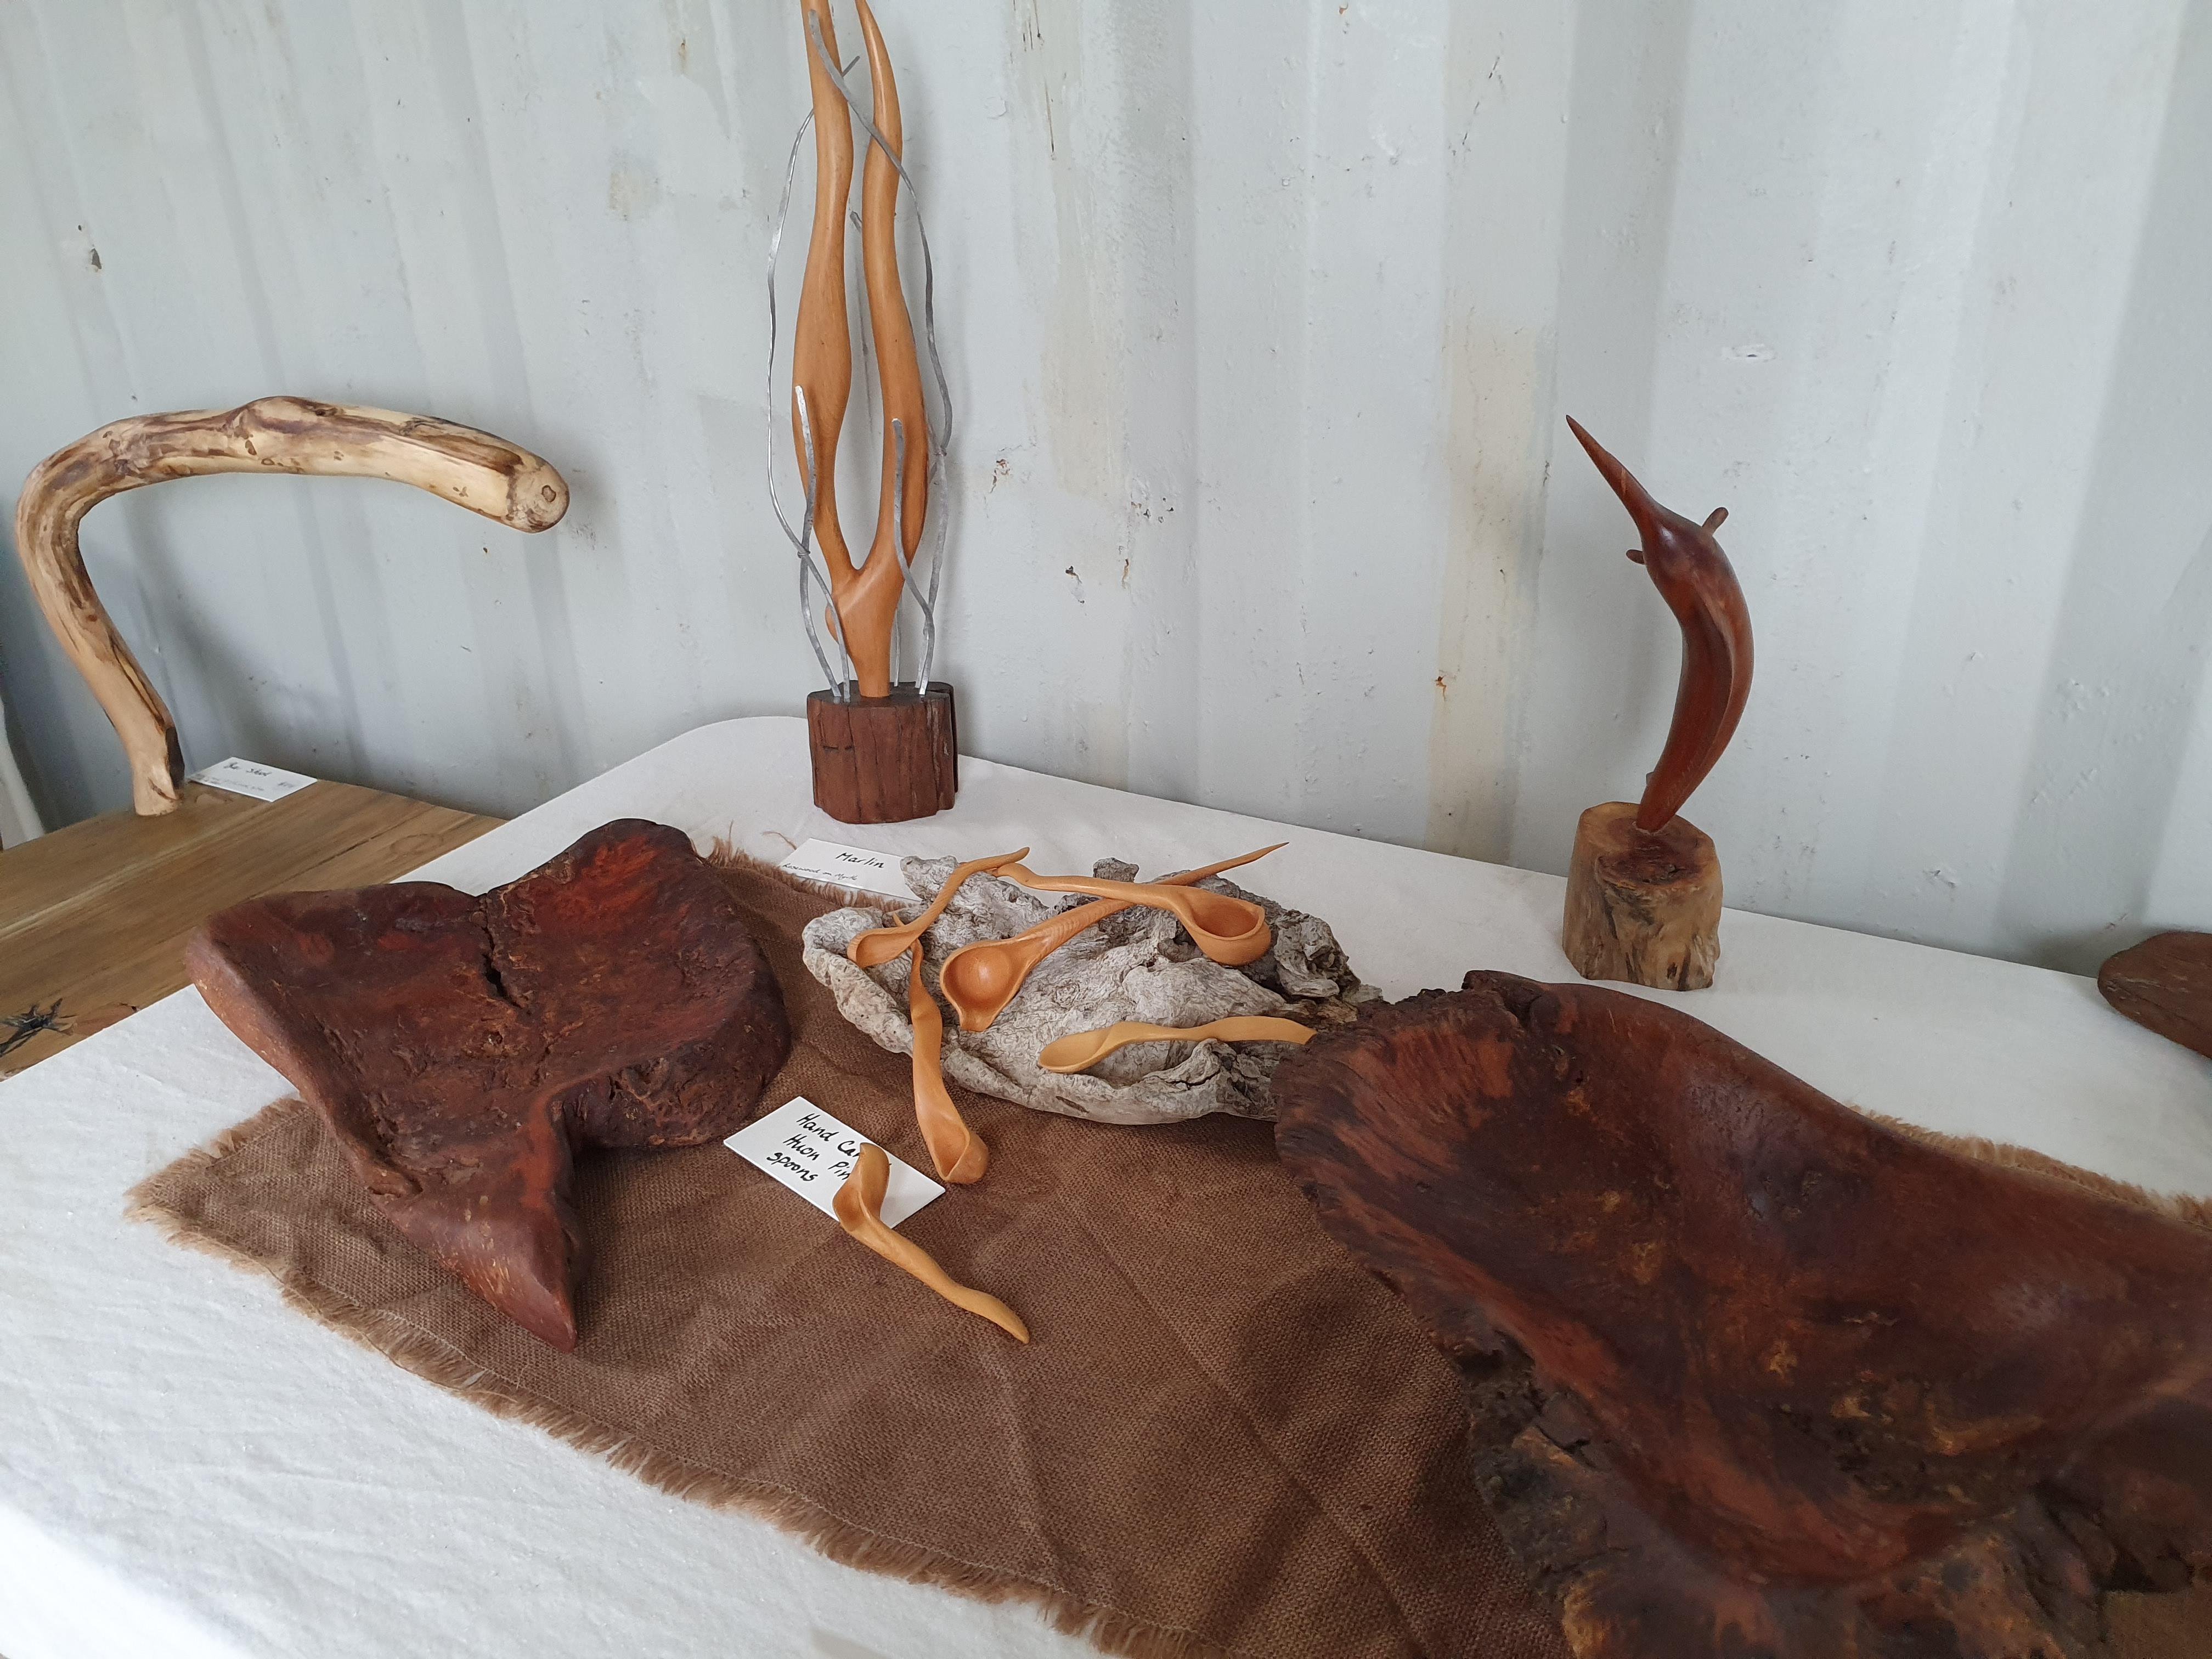 driftwood bowls huon pine spoons